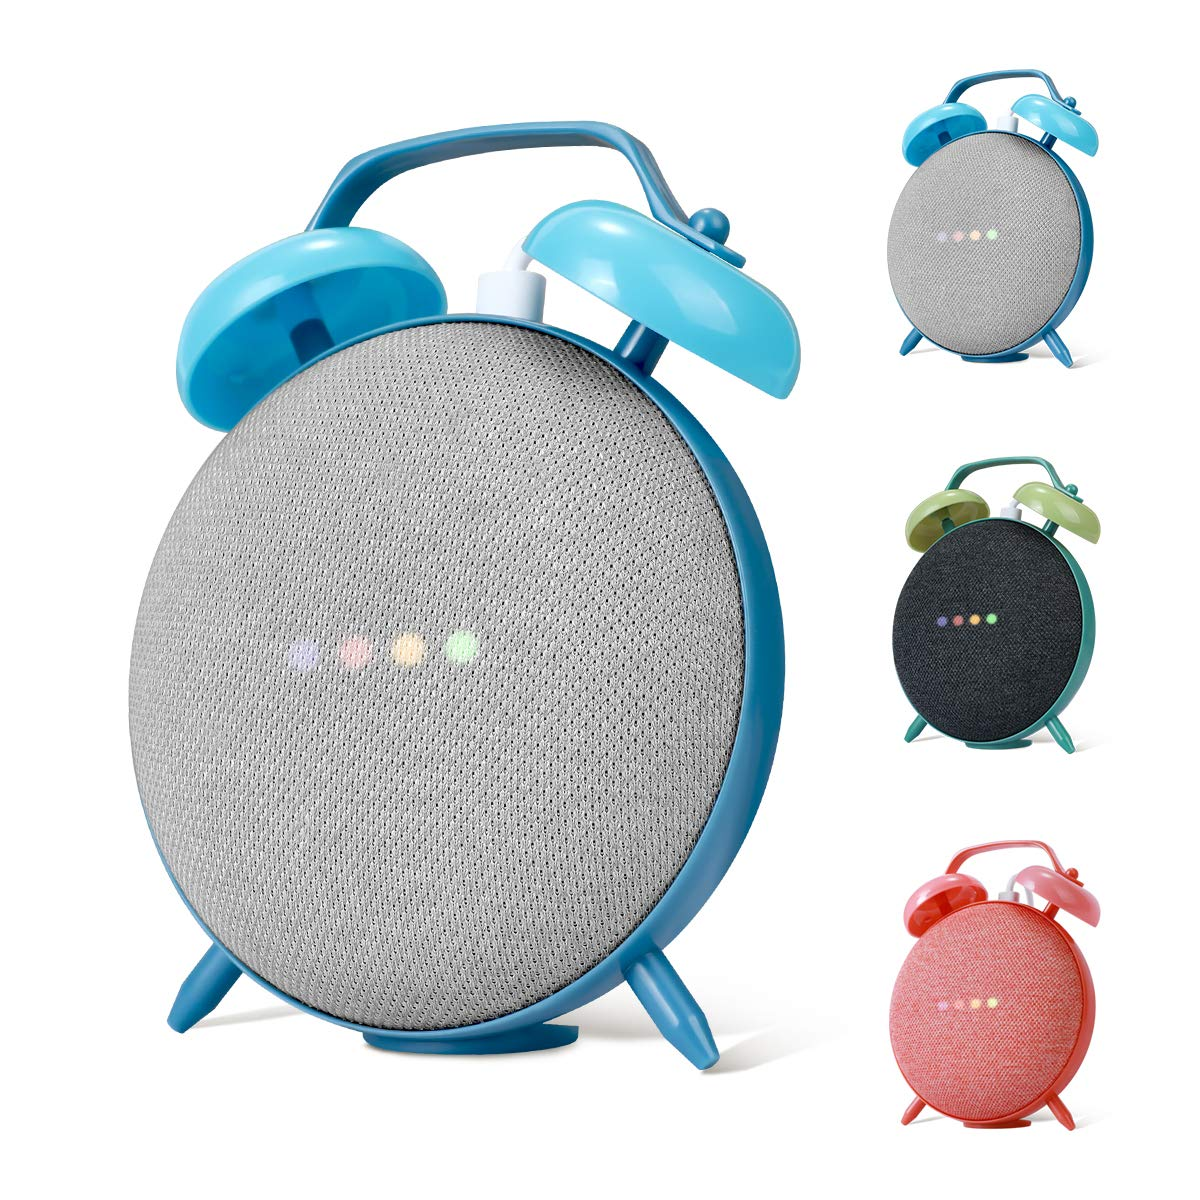 LANMU Alarm Clock Stand Compatible with Google Home Mini and Nest Mini (2nd Gen),Retro Alarm Clock Case Mount…